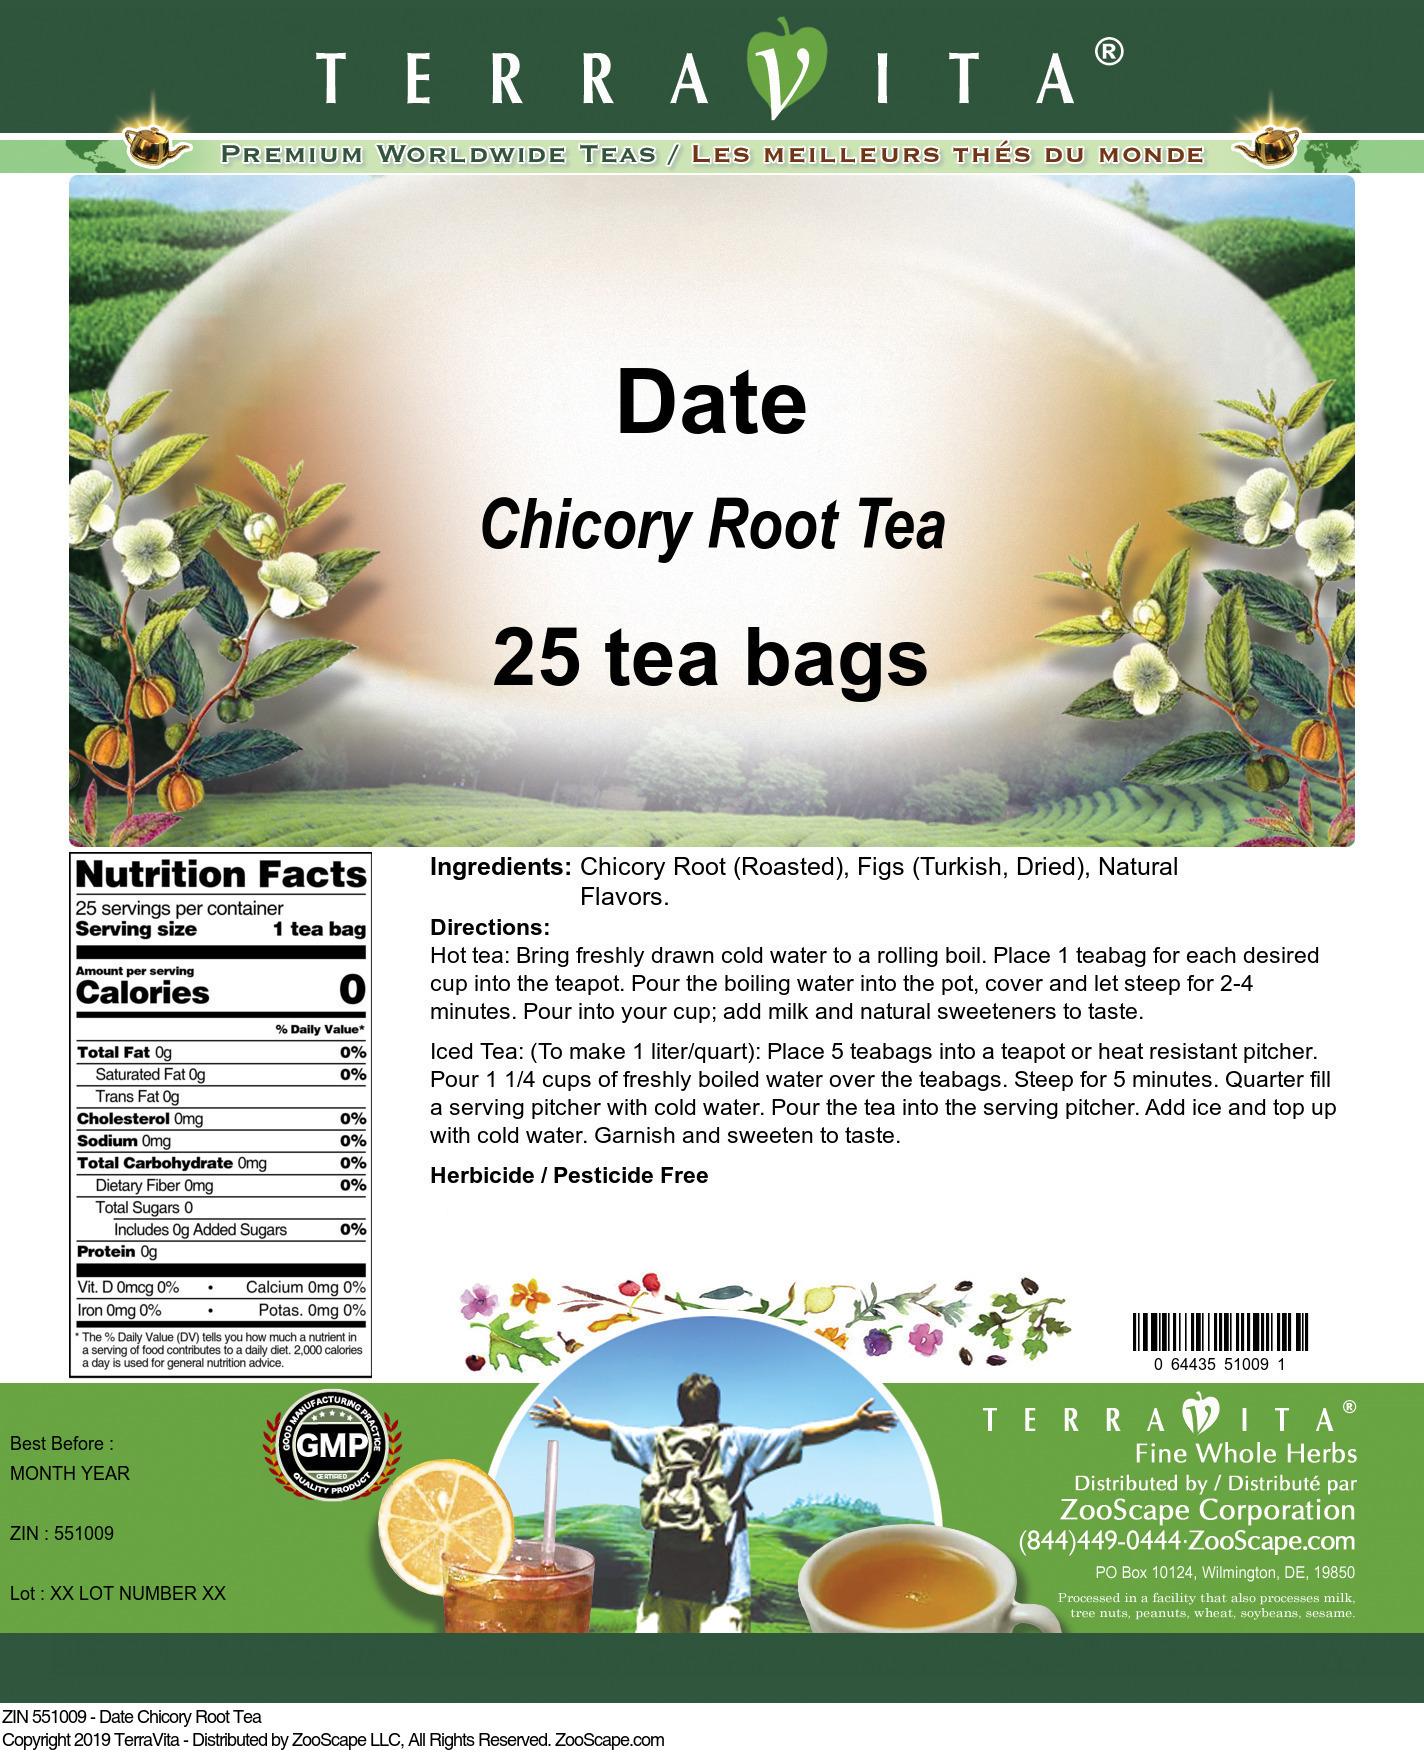 Date Chicory Root Tea